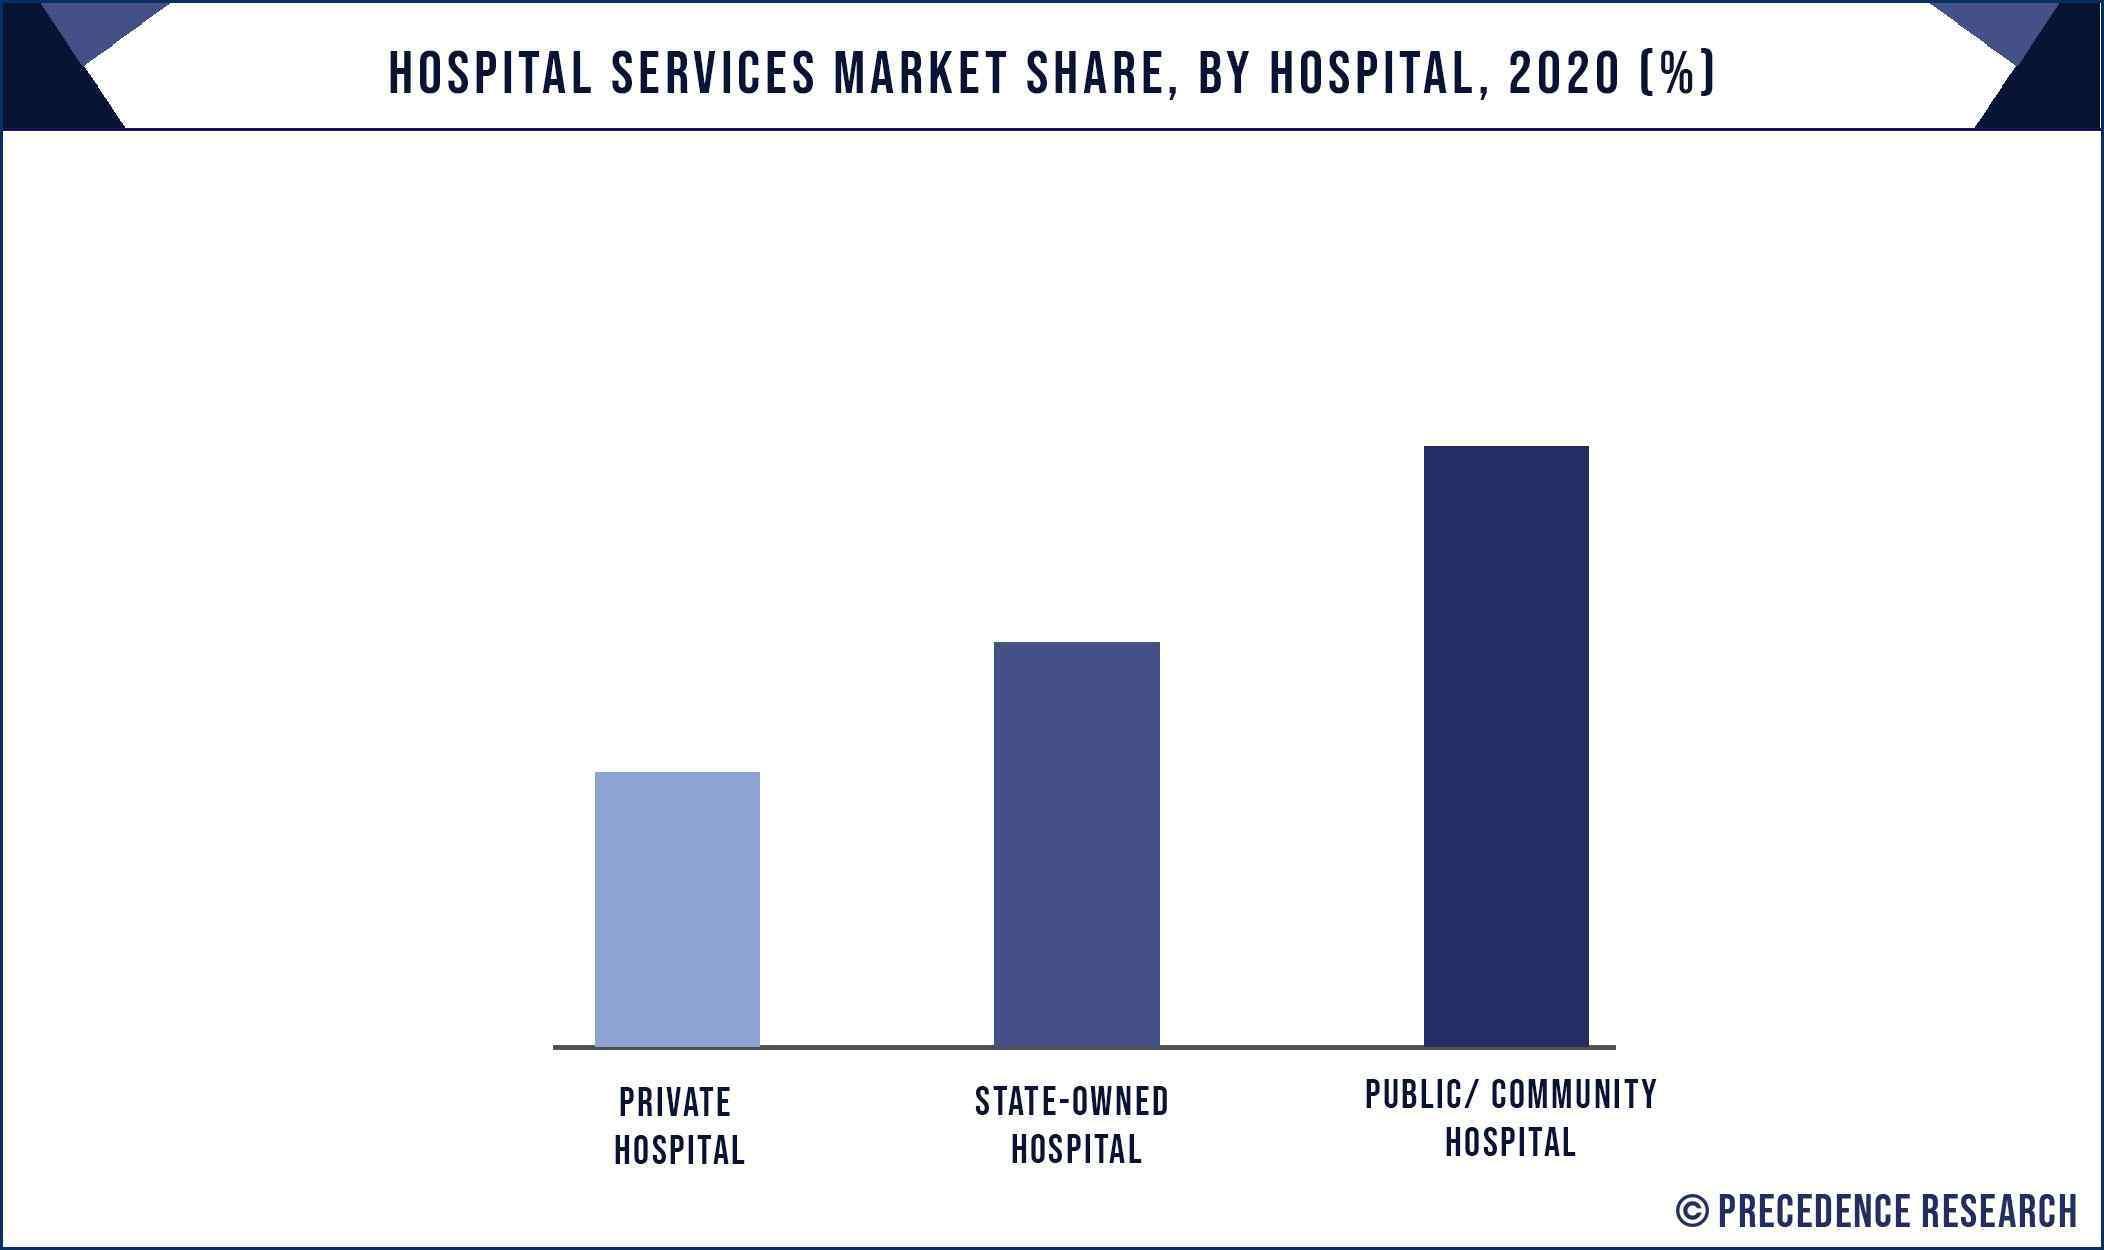 Hospital Services Market Share, By Hospital, 2020 (%)